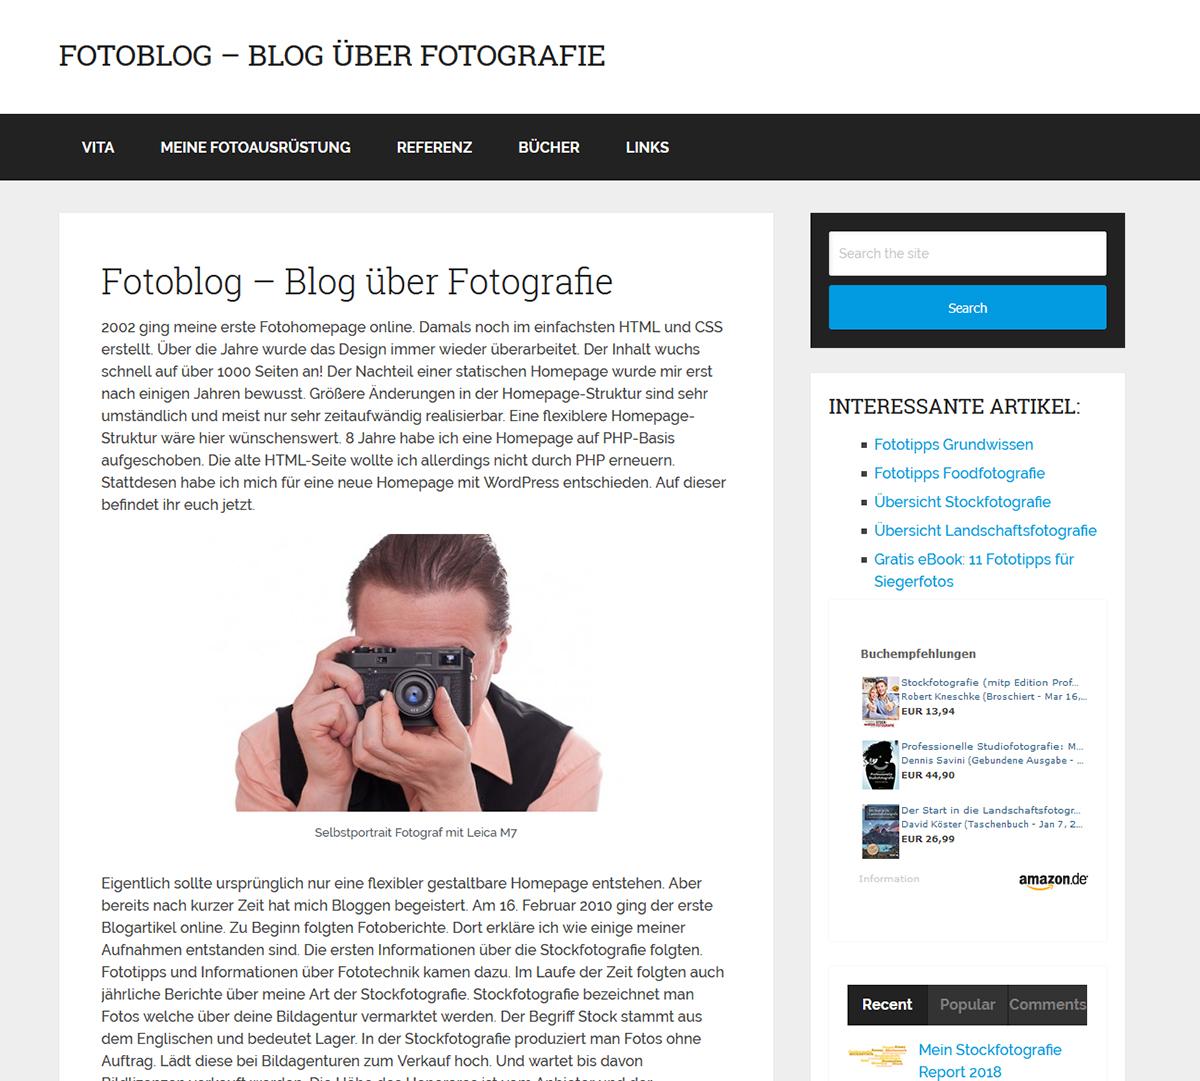 www.blog-ueber-fotografie.de